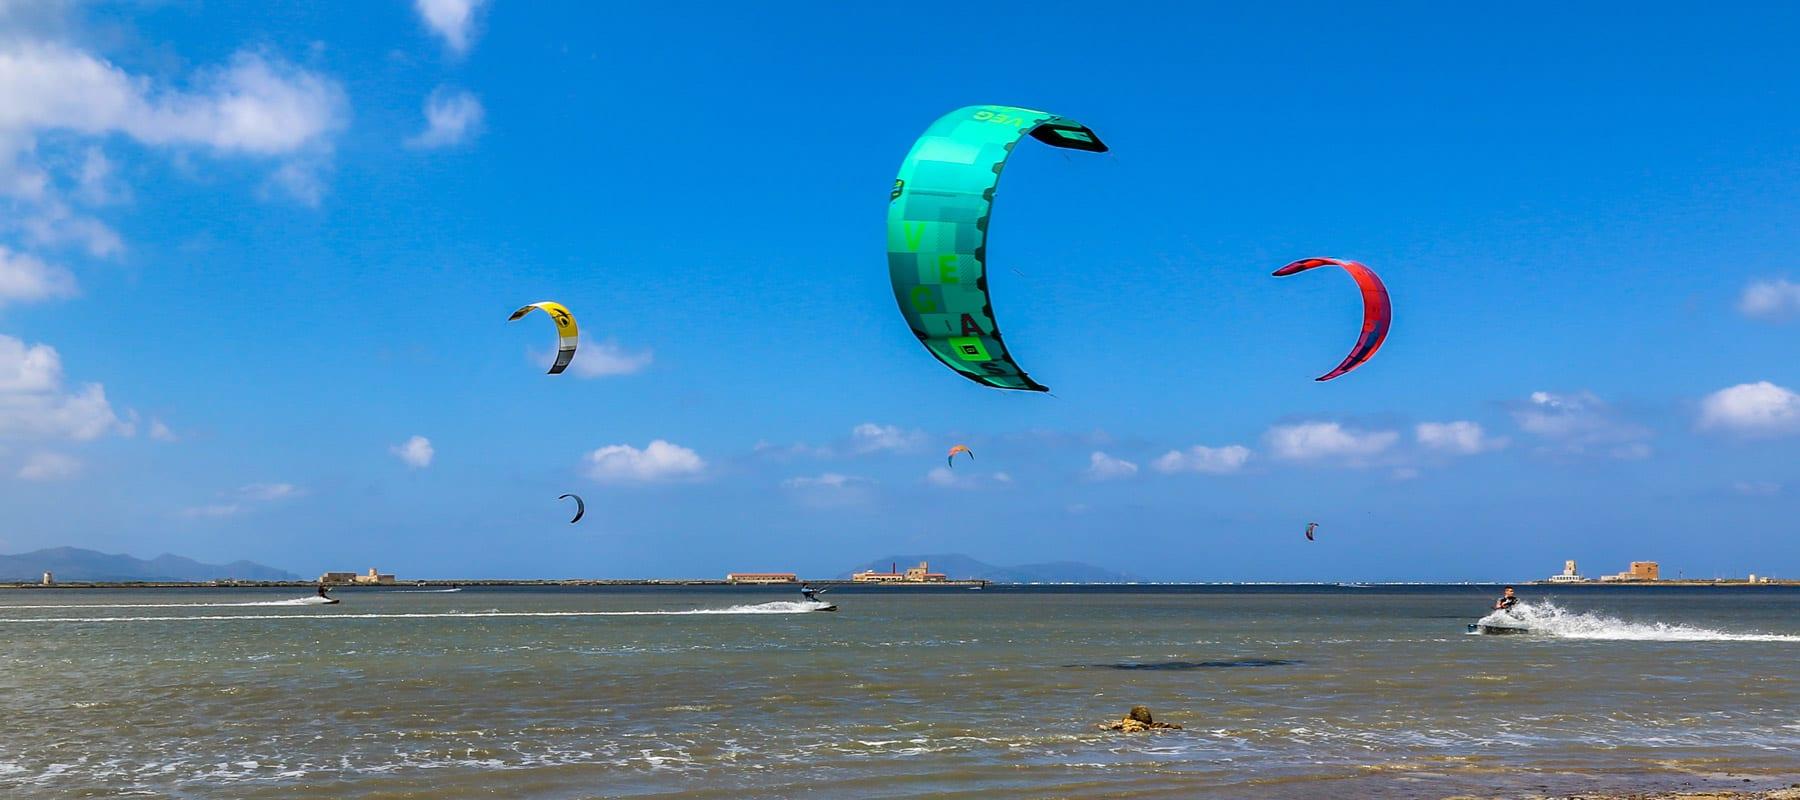 Wind, Klima, Wetter, beste Reisezeit, Kitesurfen, Kiteboarding, Kitesurfing, Kiten, Kitereisen, Kiteurlaub, Kite Urlaub, Reisen, Sizilien, Italien